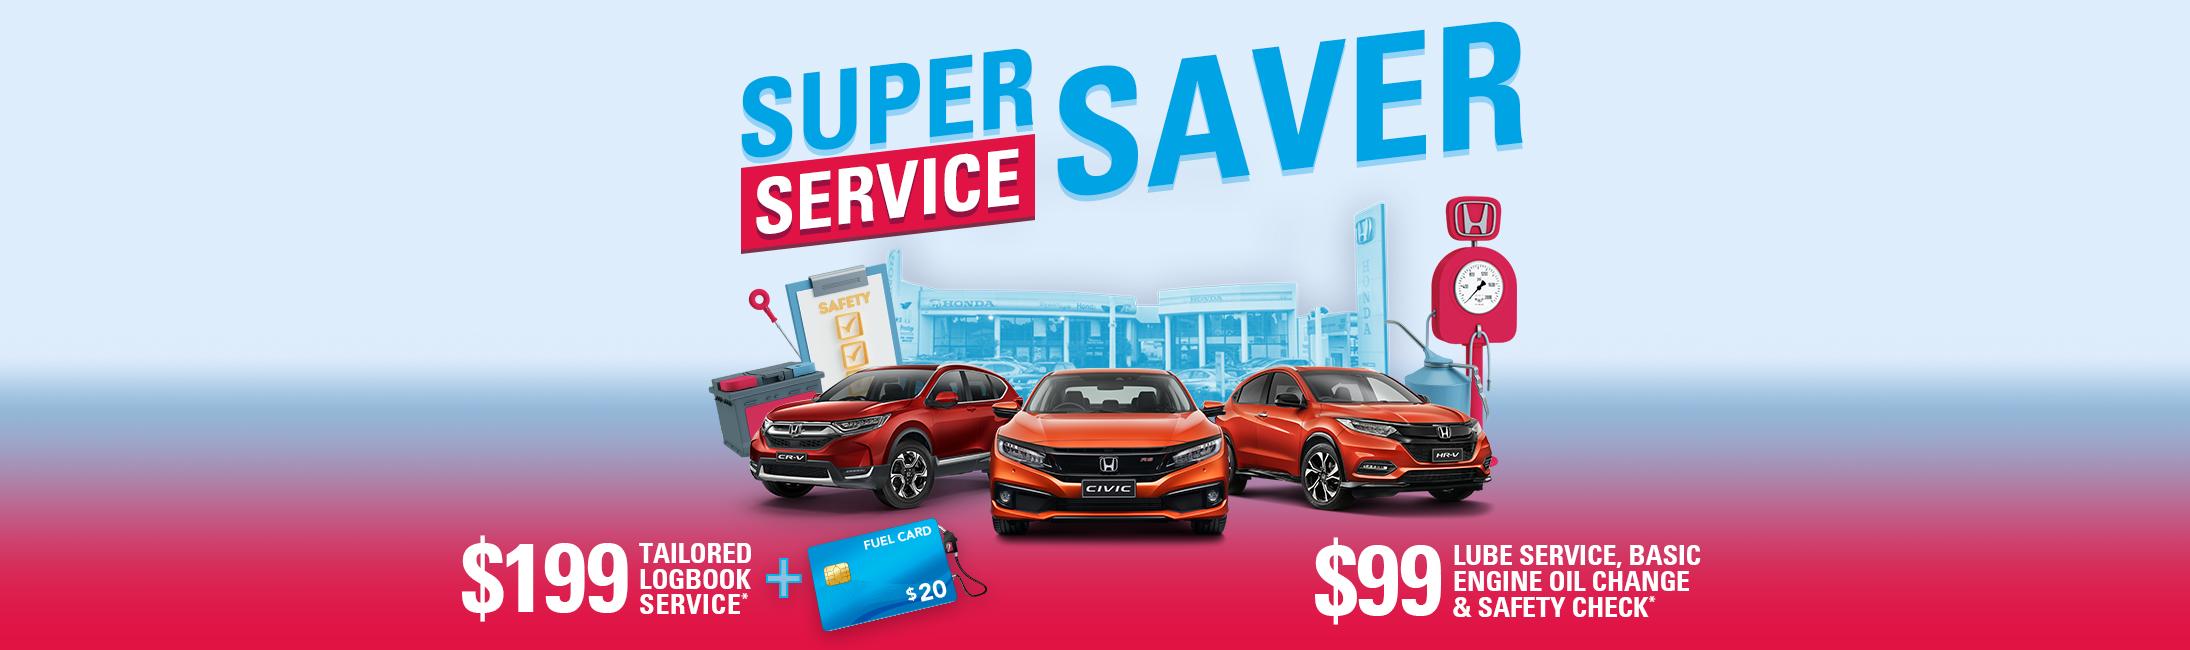 Super Service Saver at Prestige Honda.